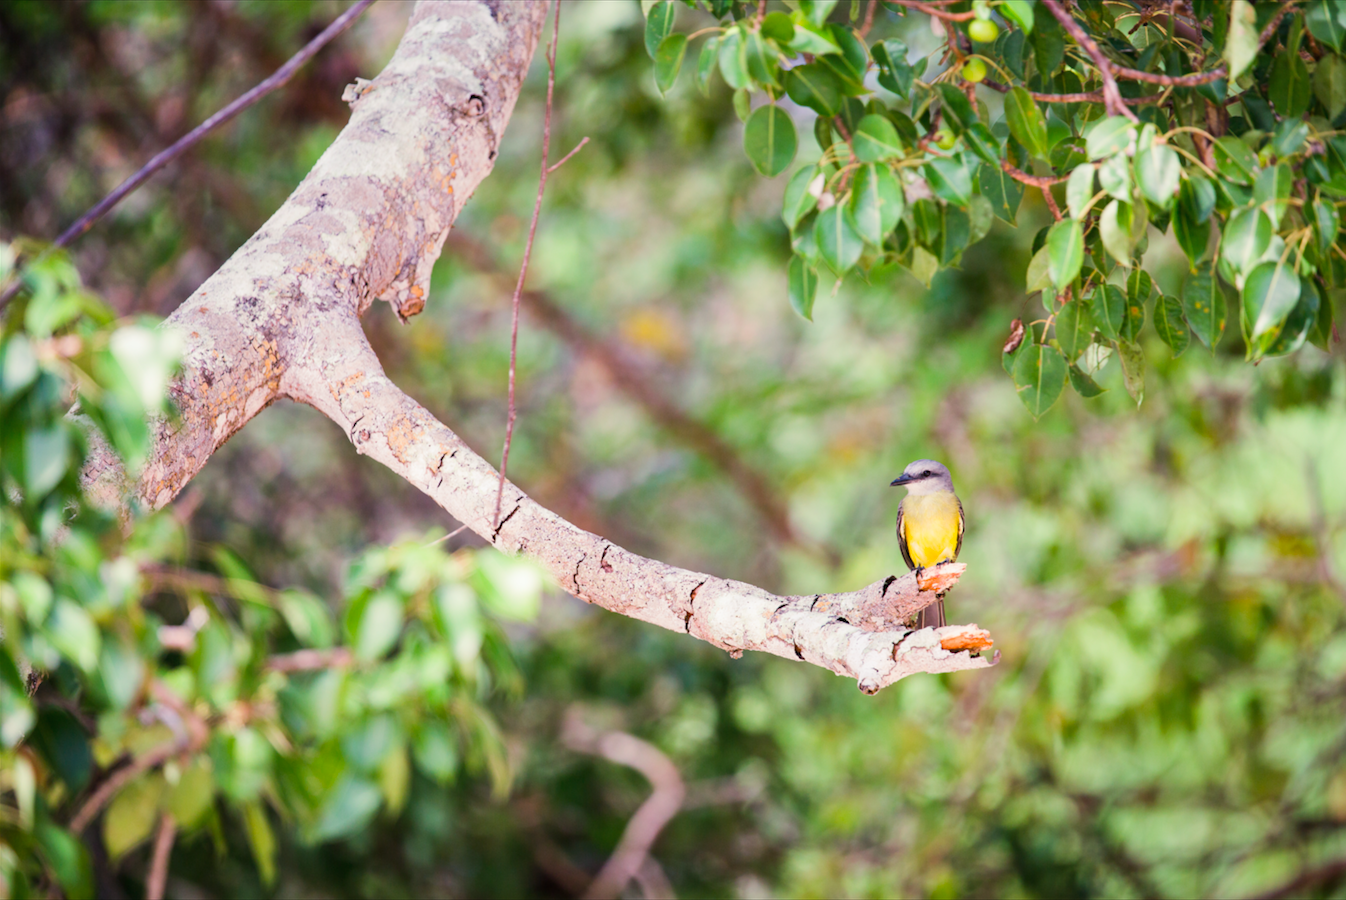 - A Tropical kingbird — Isla Chapera